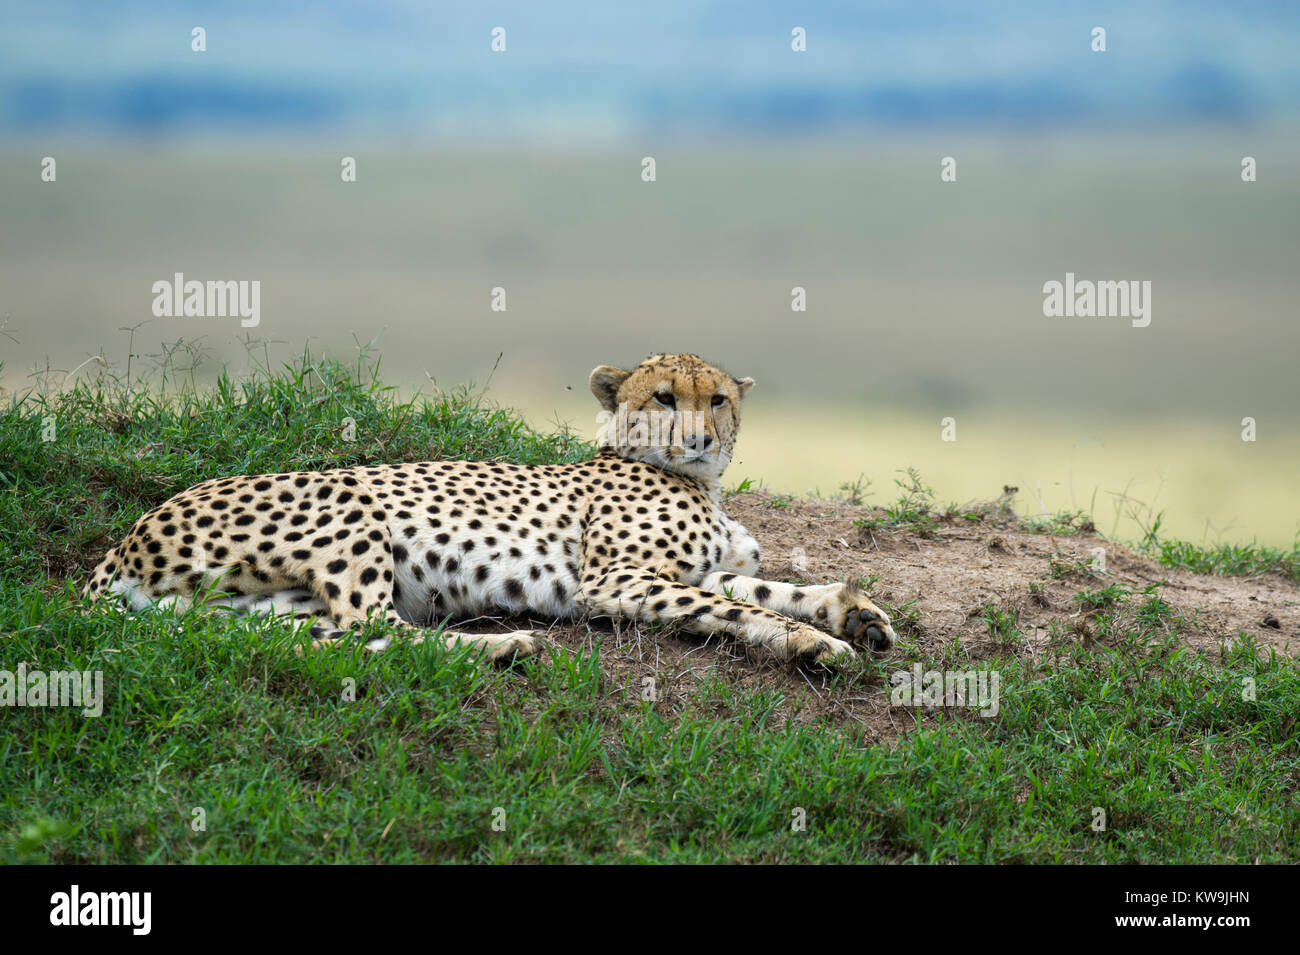 Cheetah resting on the African Savannah - Stock Image